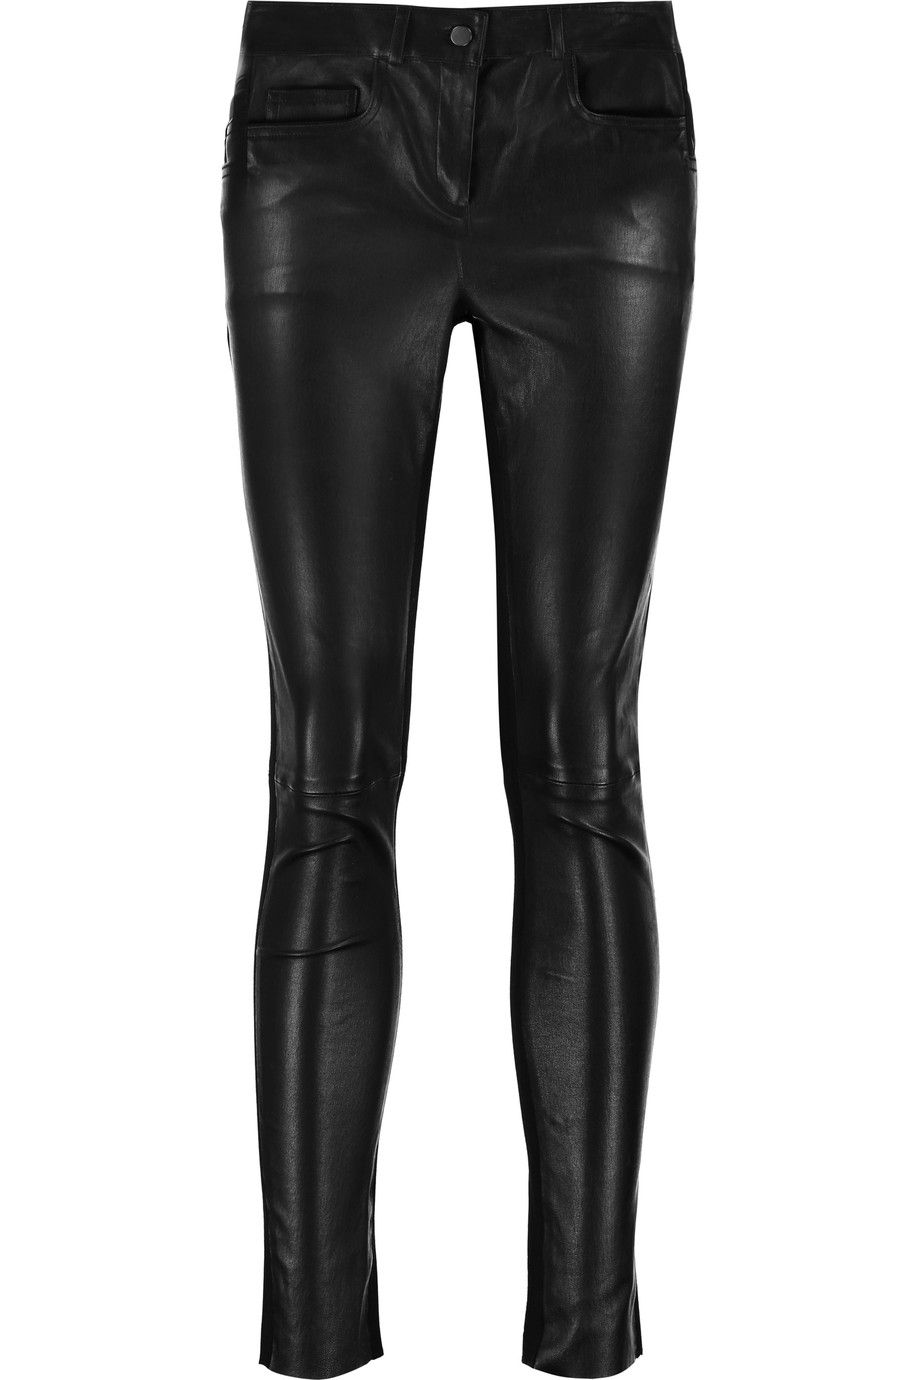 8a7c000f39 JOSEPH Evie mid-rise leather-paneled skinny jeans. #joseph #cloth #jeans